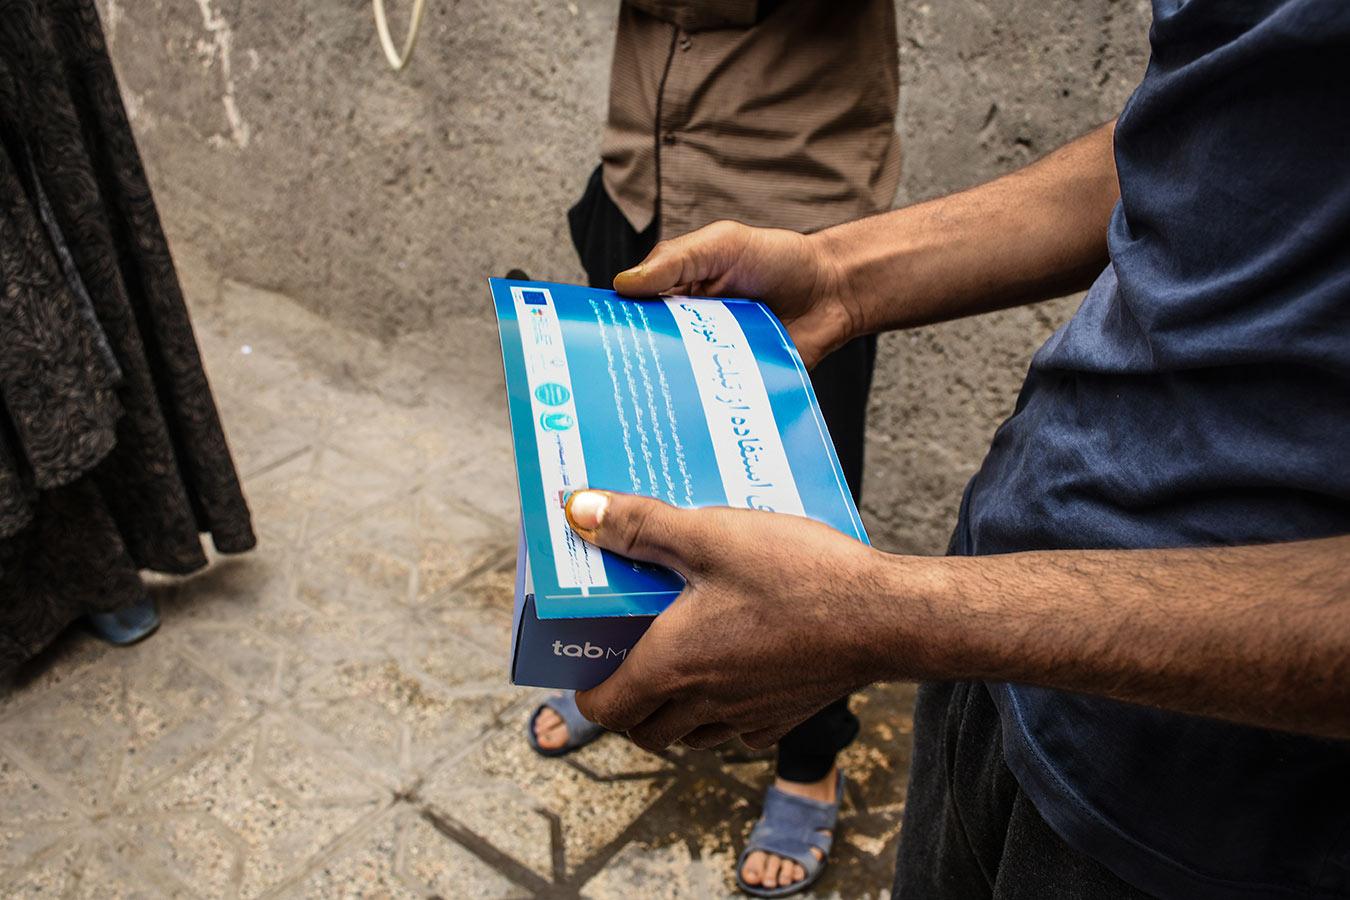 iran-tablets-12242020.jpg